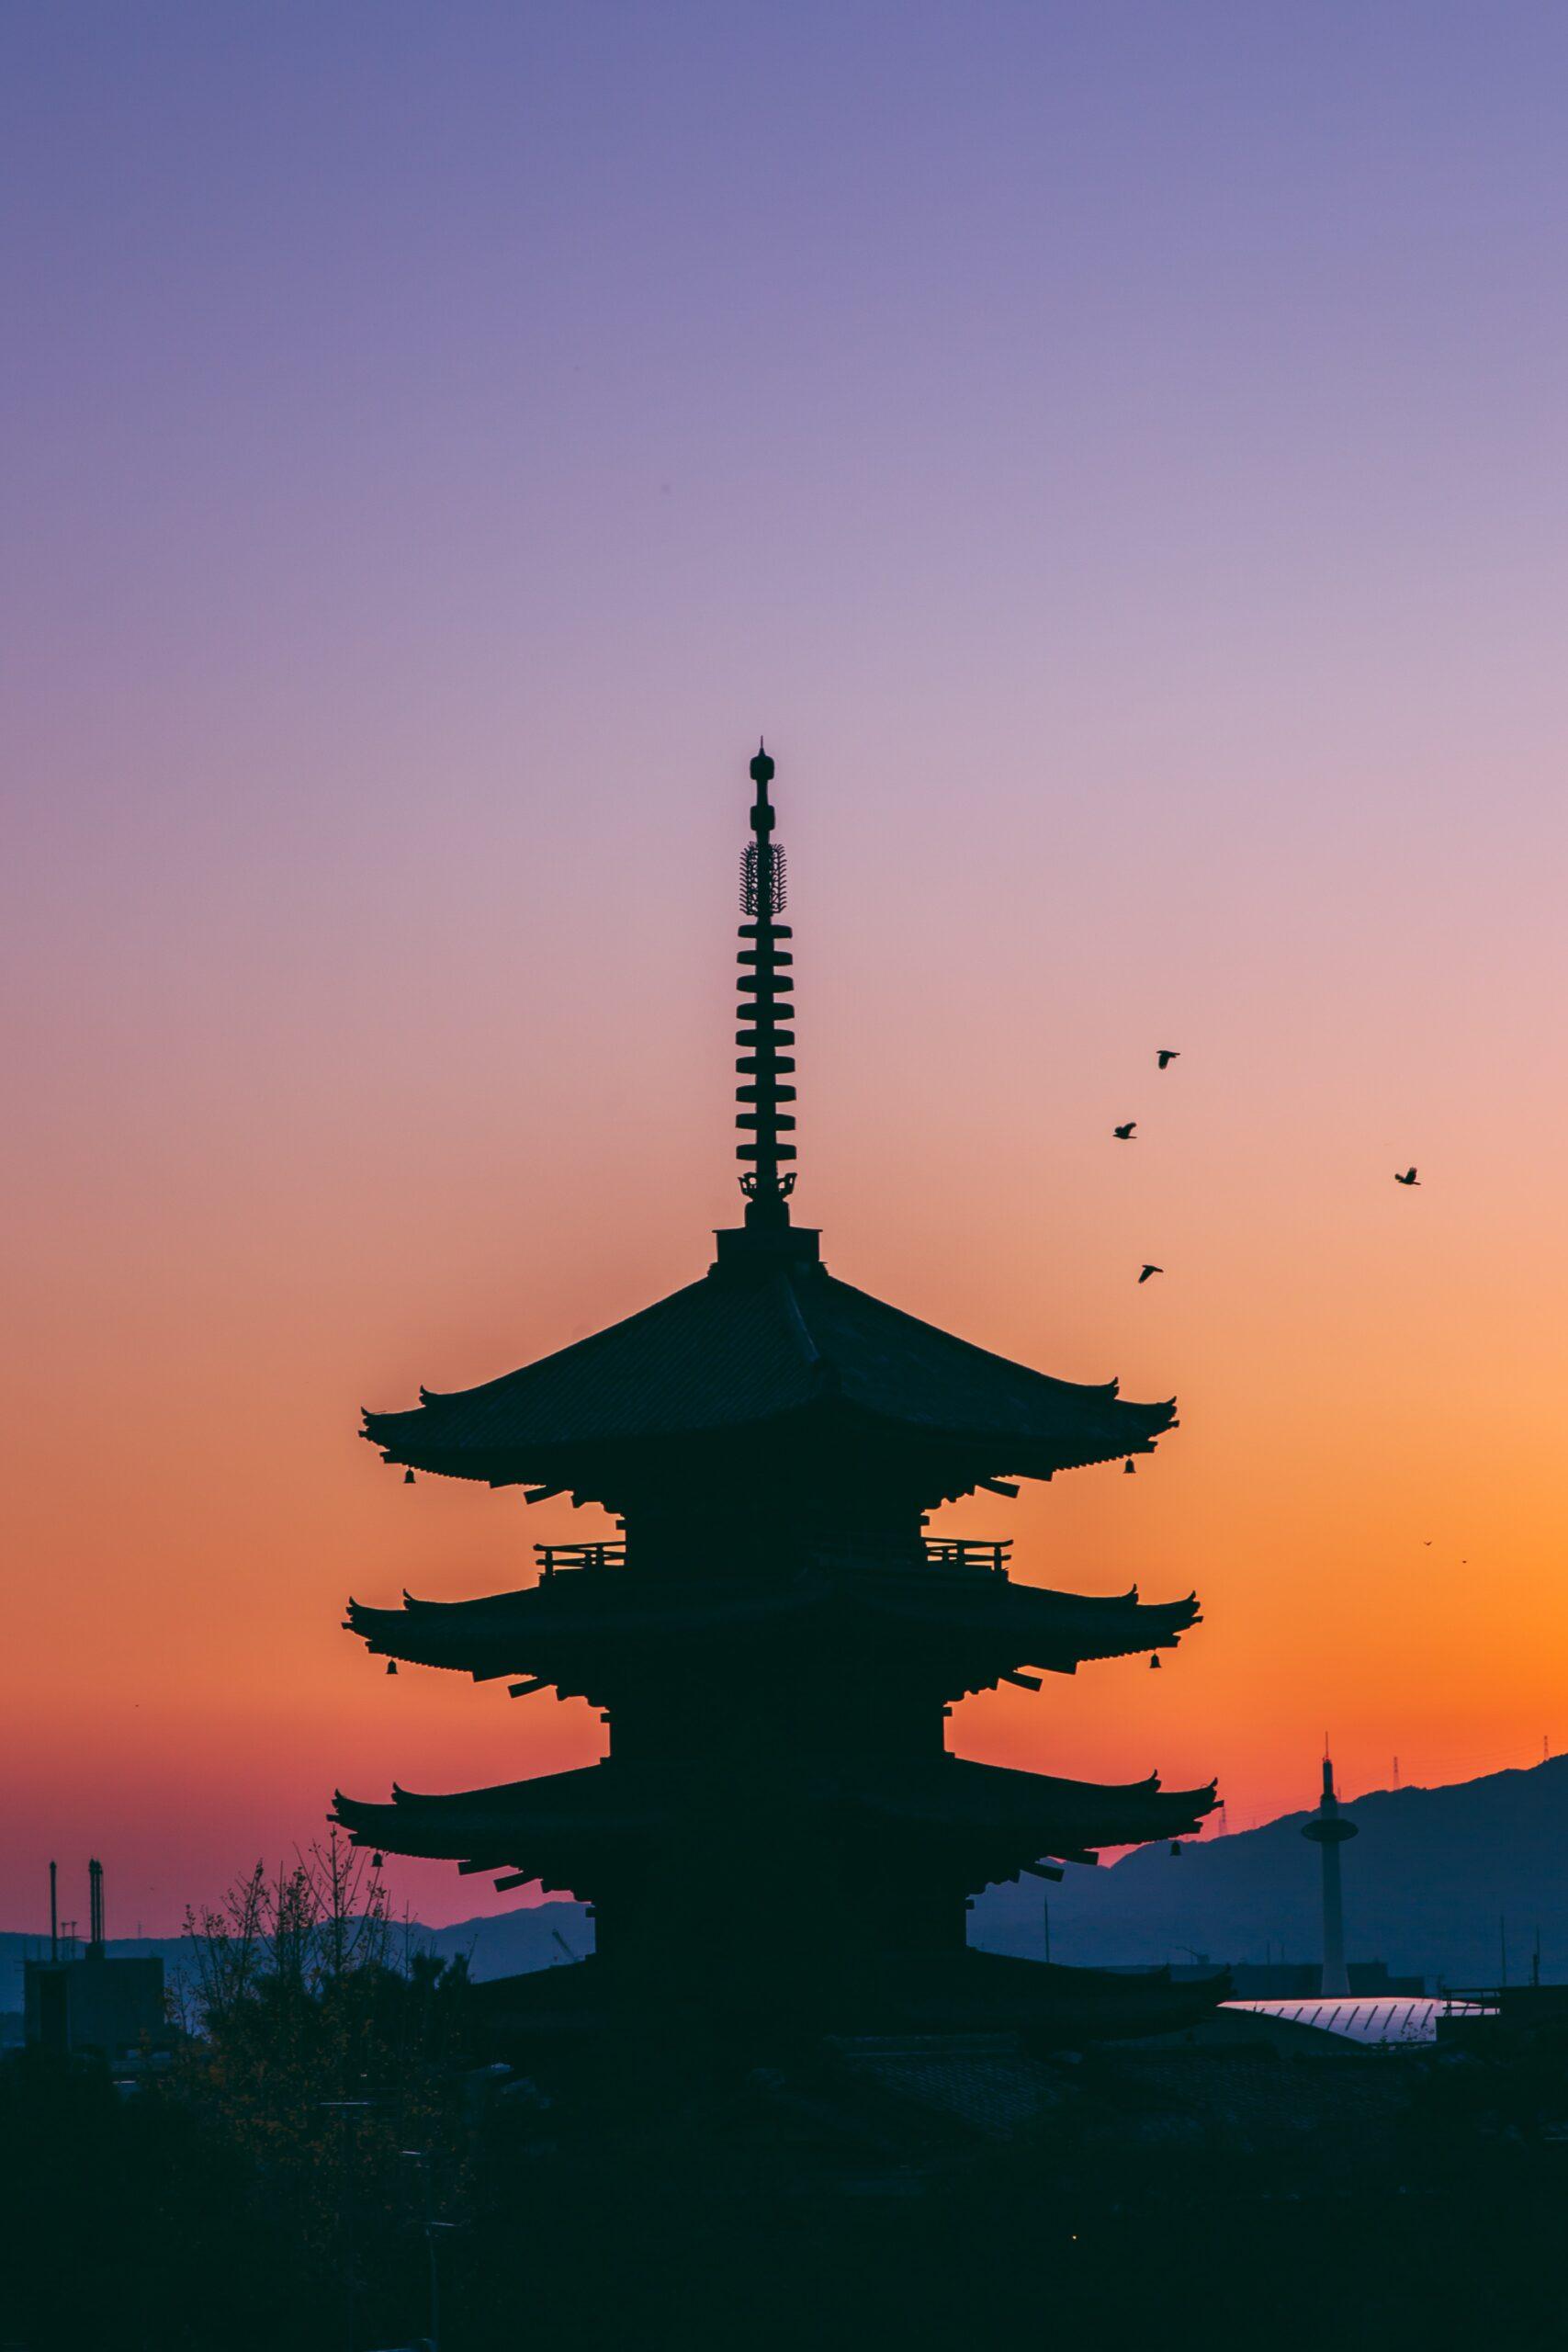 ash-edmonds-Tokyo Japanese Zen Temple spires evening-unsplash